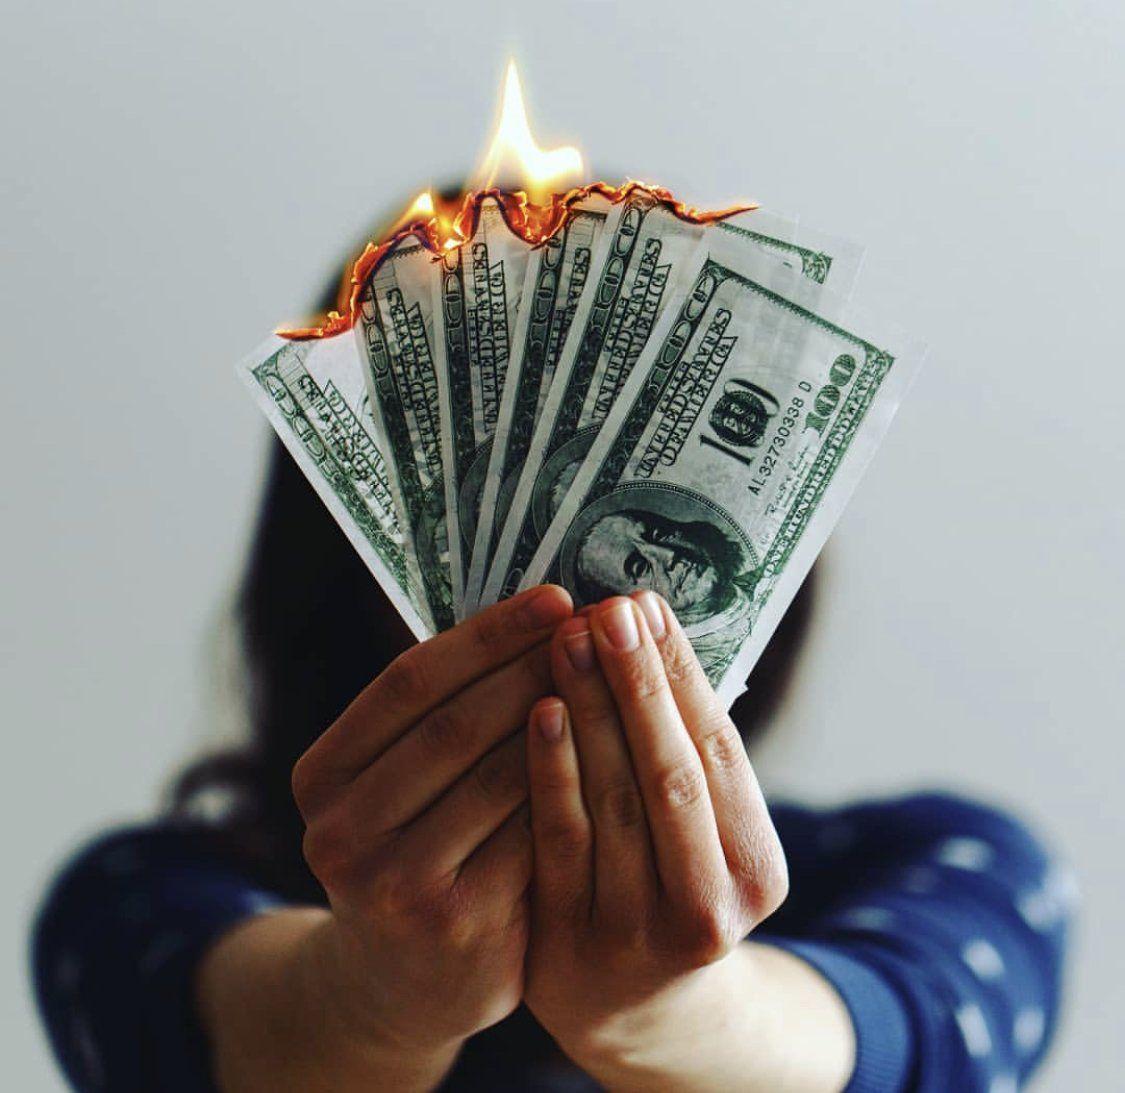 100 dollar bills on fire